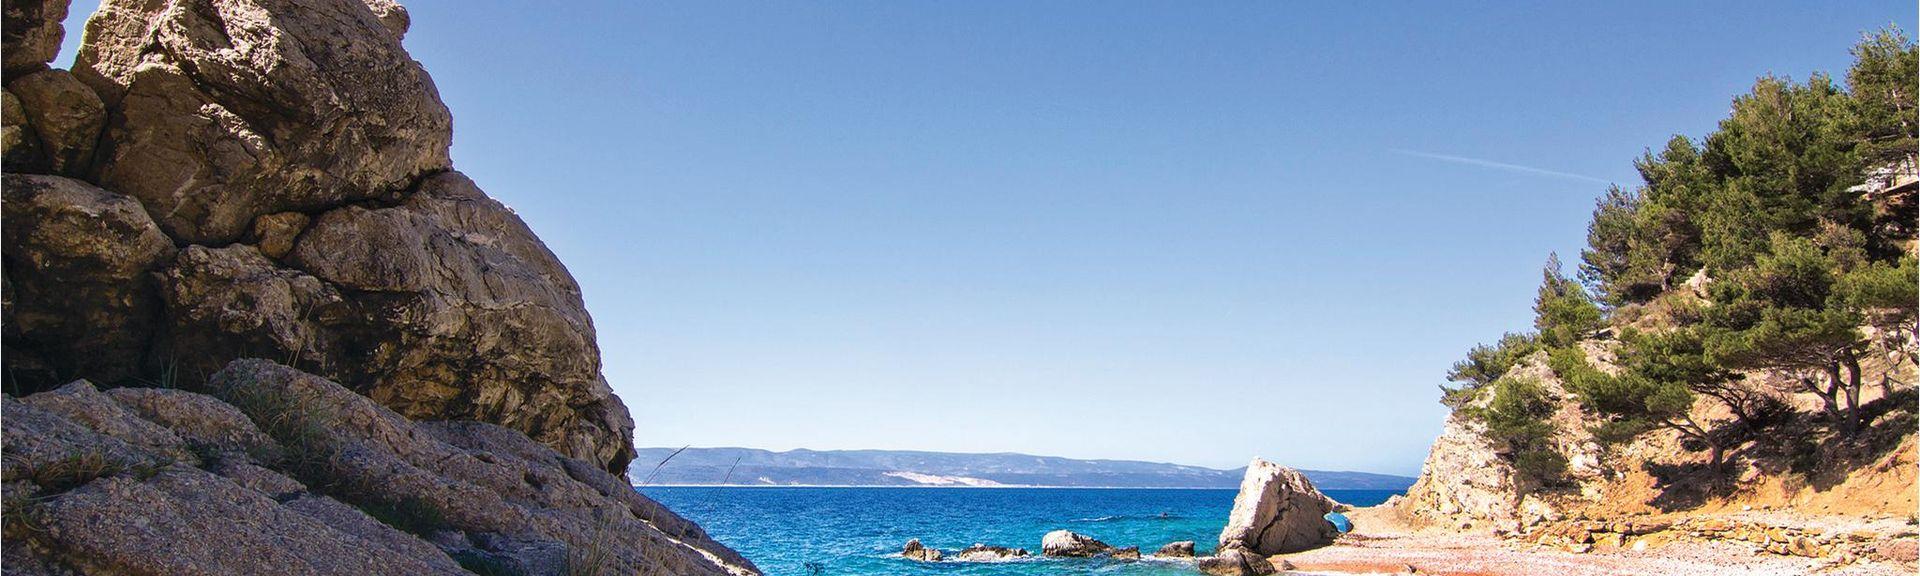 Playa Zlatni Rat, Bol, Split-Dalmacia, Croacia